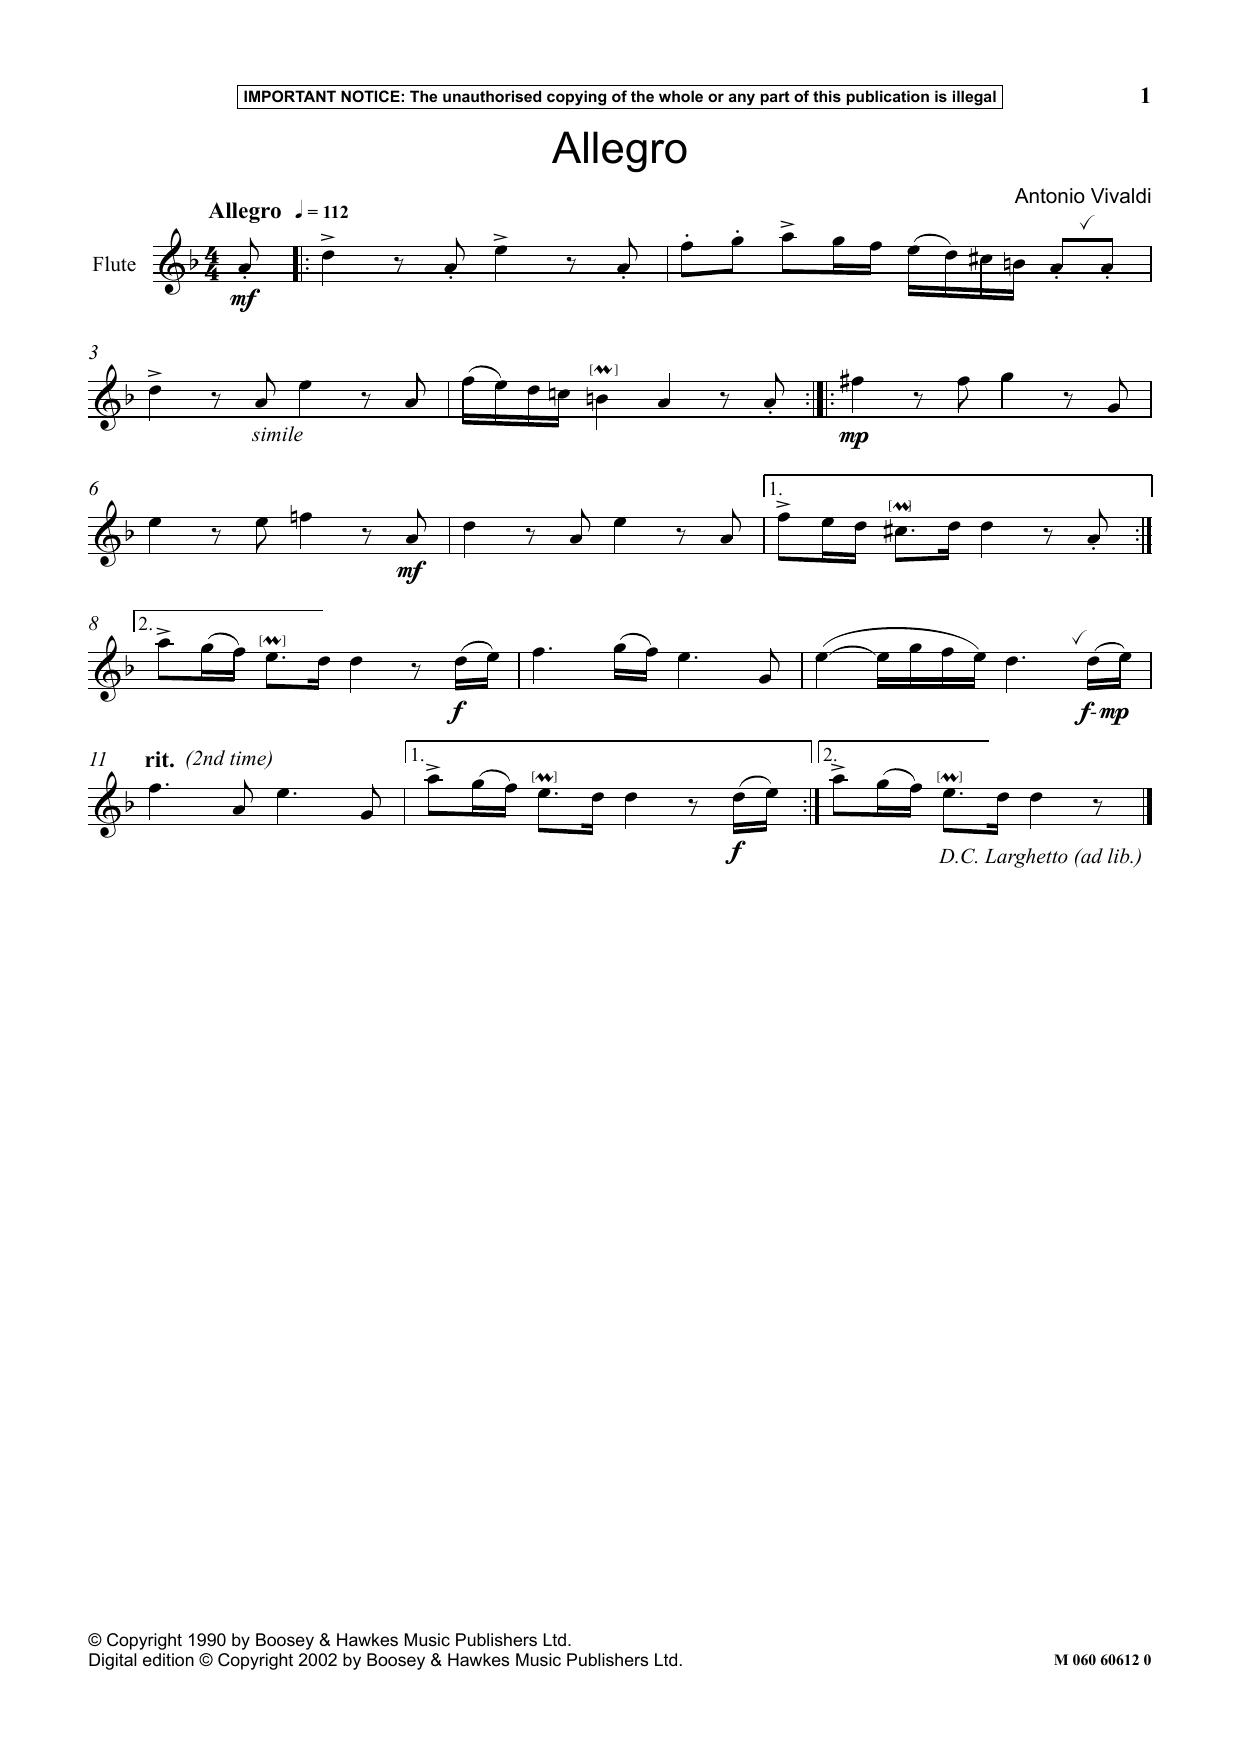 Download Antonio Vivaldi 'Allegro' Digital Sheet Music Notes & Chords and start playing in minutes